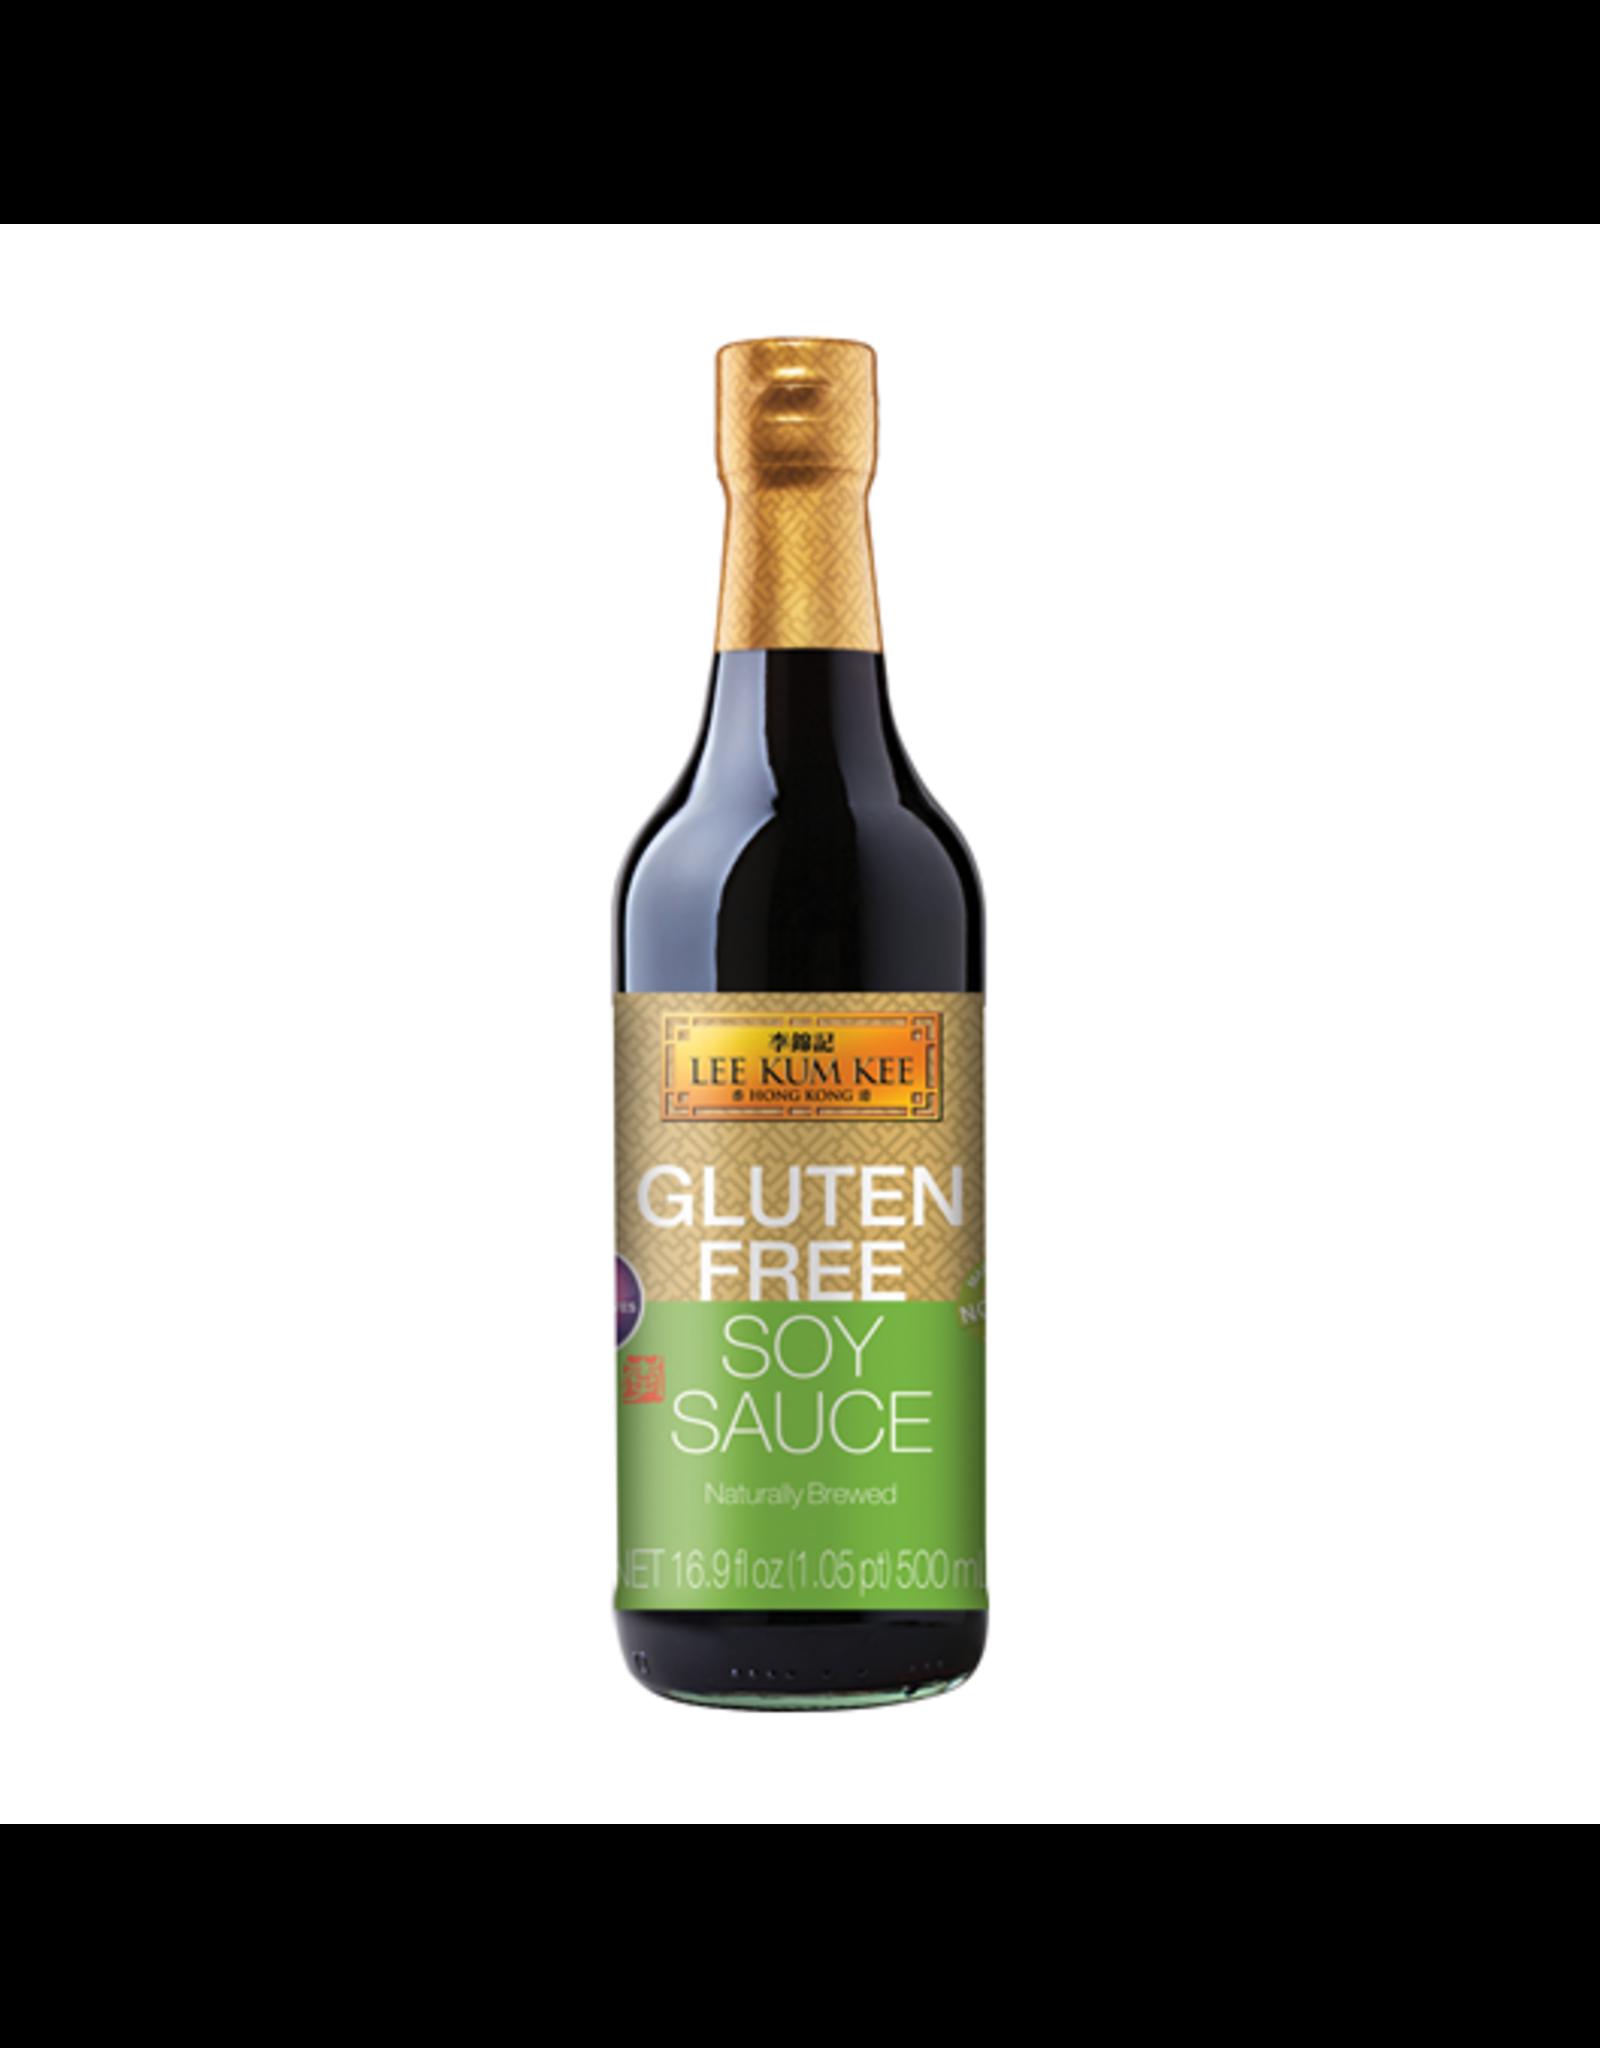 Lee Kum Kee Gluten Free Light Soy Sauce